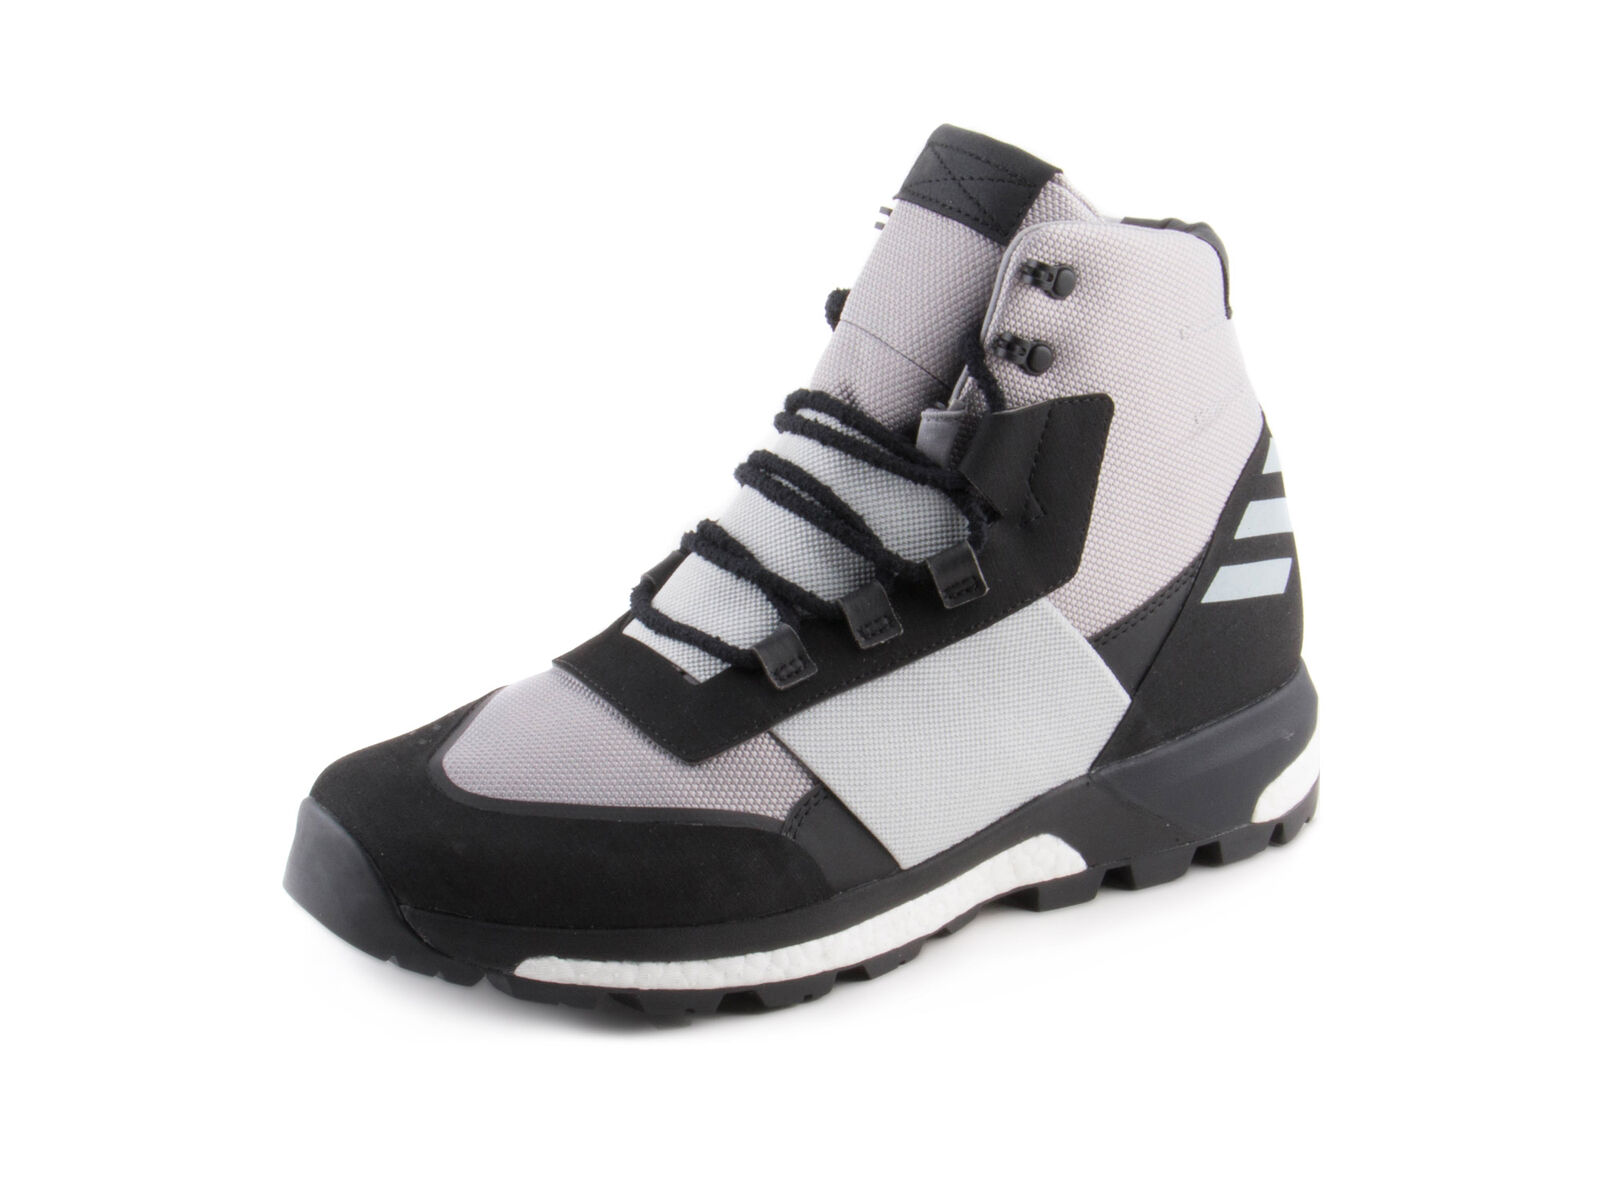 Adidas  Mens ADO Ulimate Boot  DAY ONE  LTONIX STONE BLKWHI CQ2609